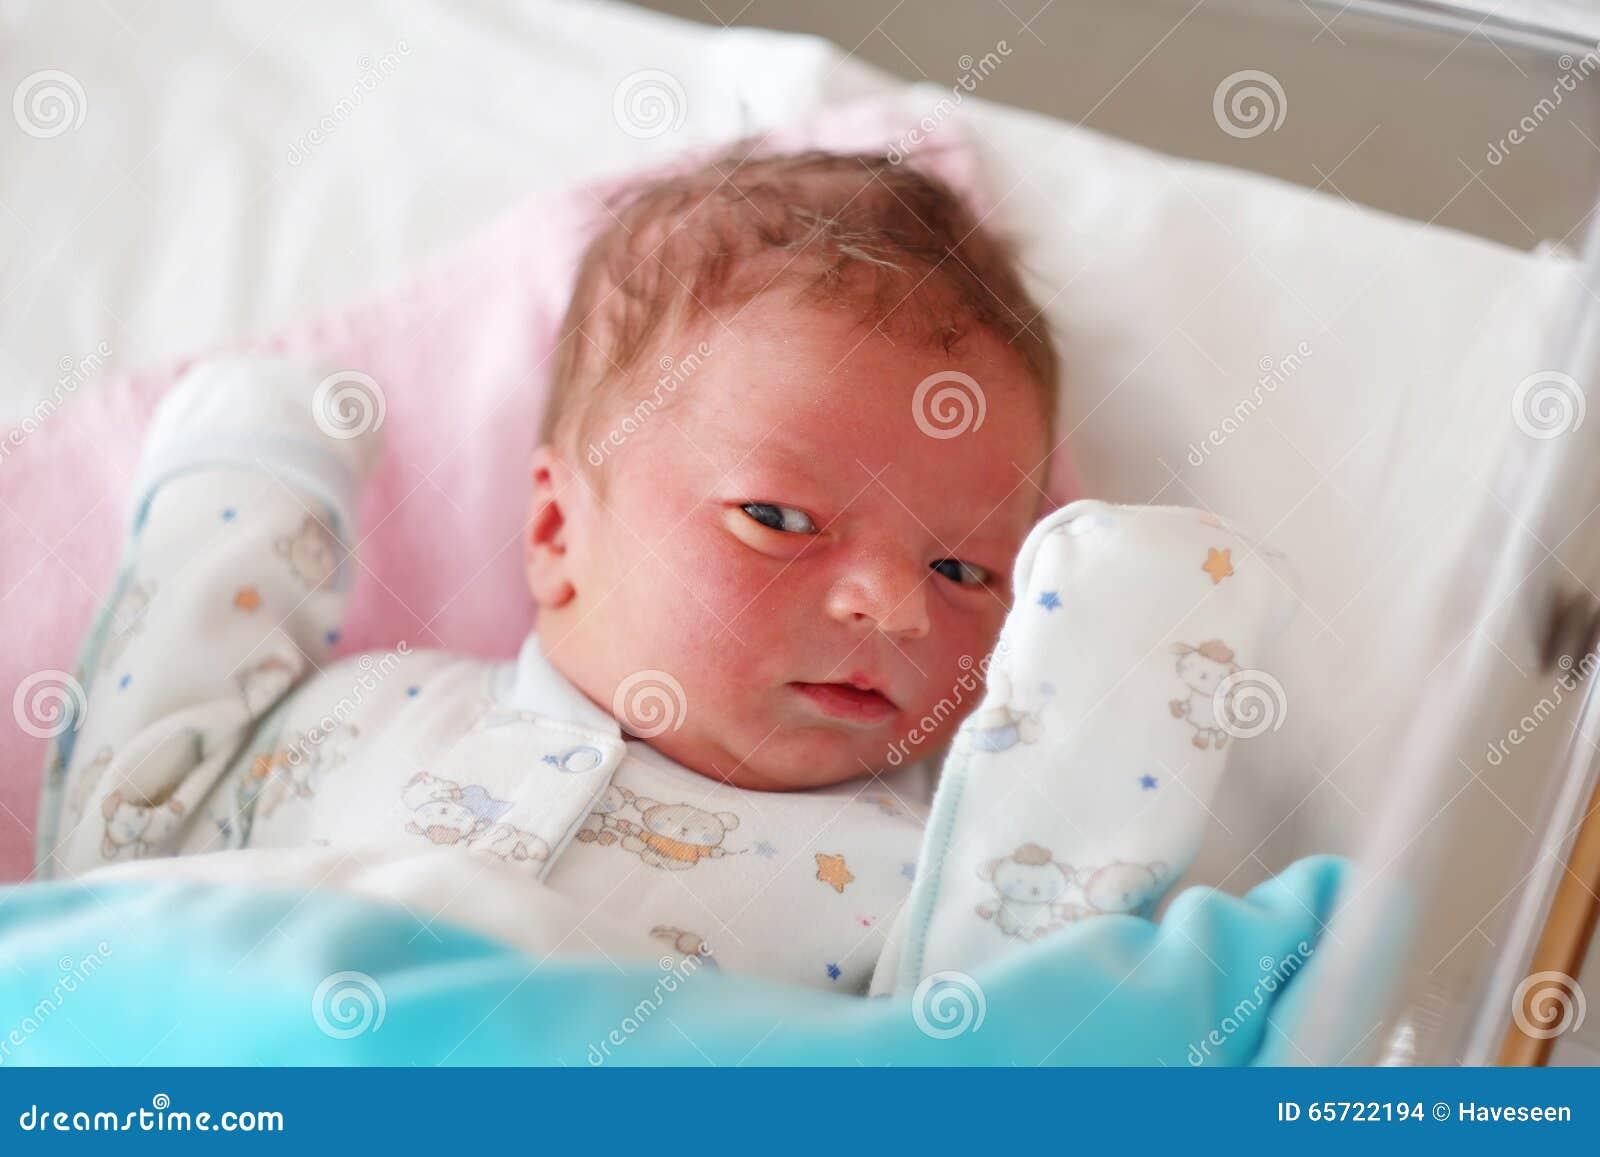 One Day Old Newborn Baby